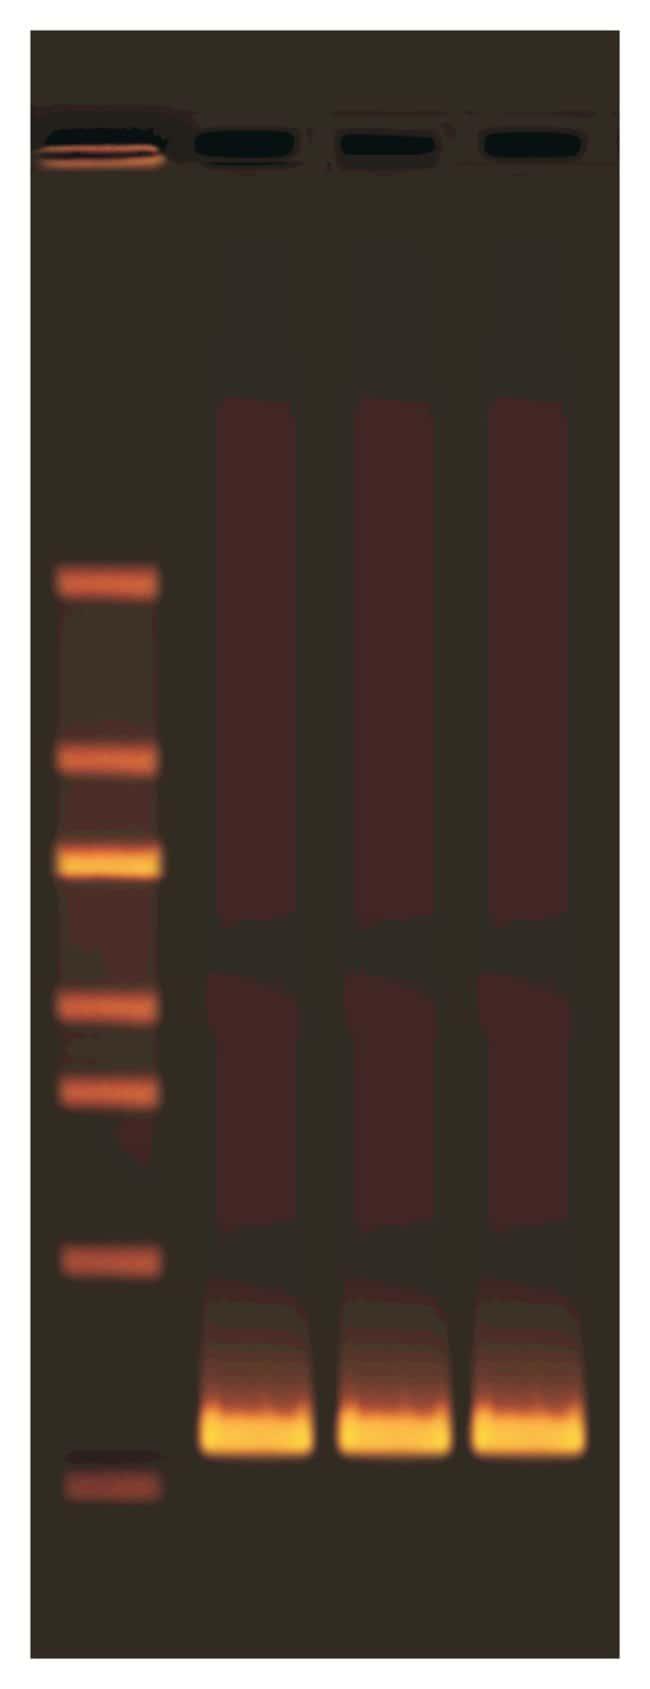 EdvotekExploring the Genetics of Taste: SNP Analysis of the PTC Gene Using